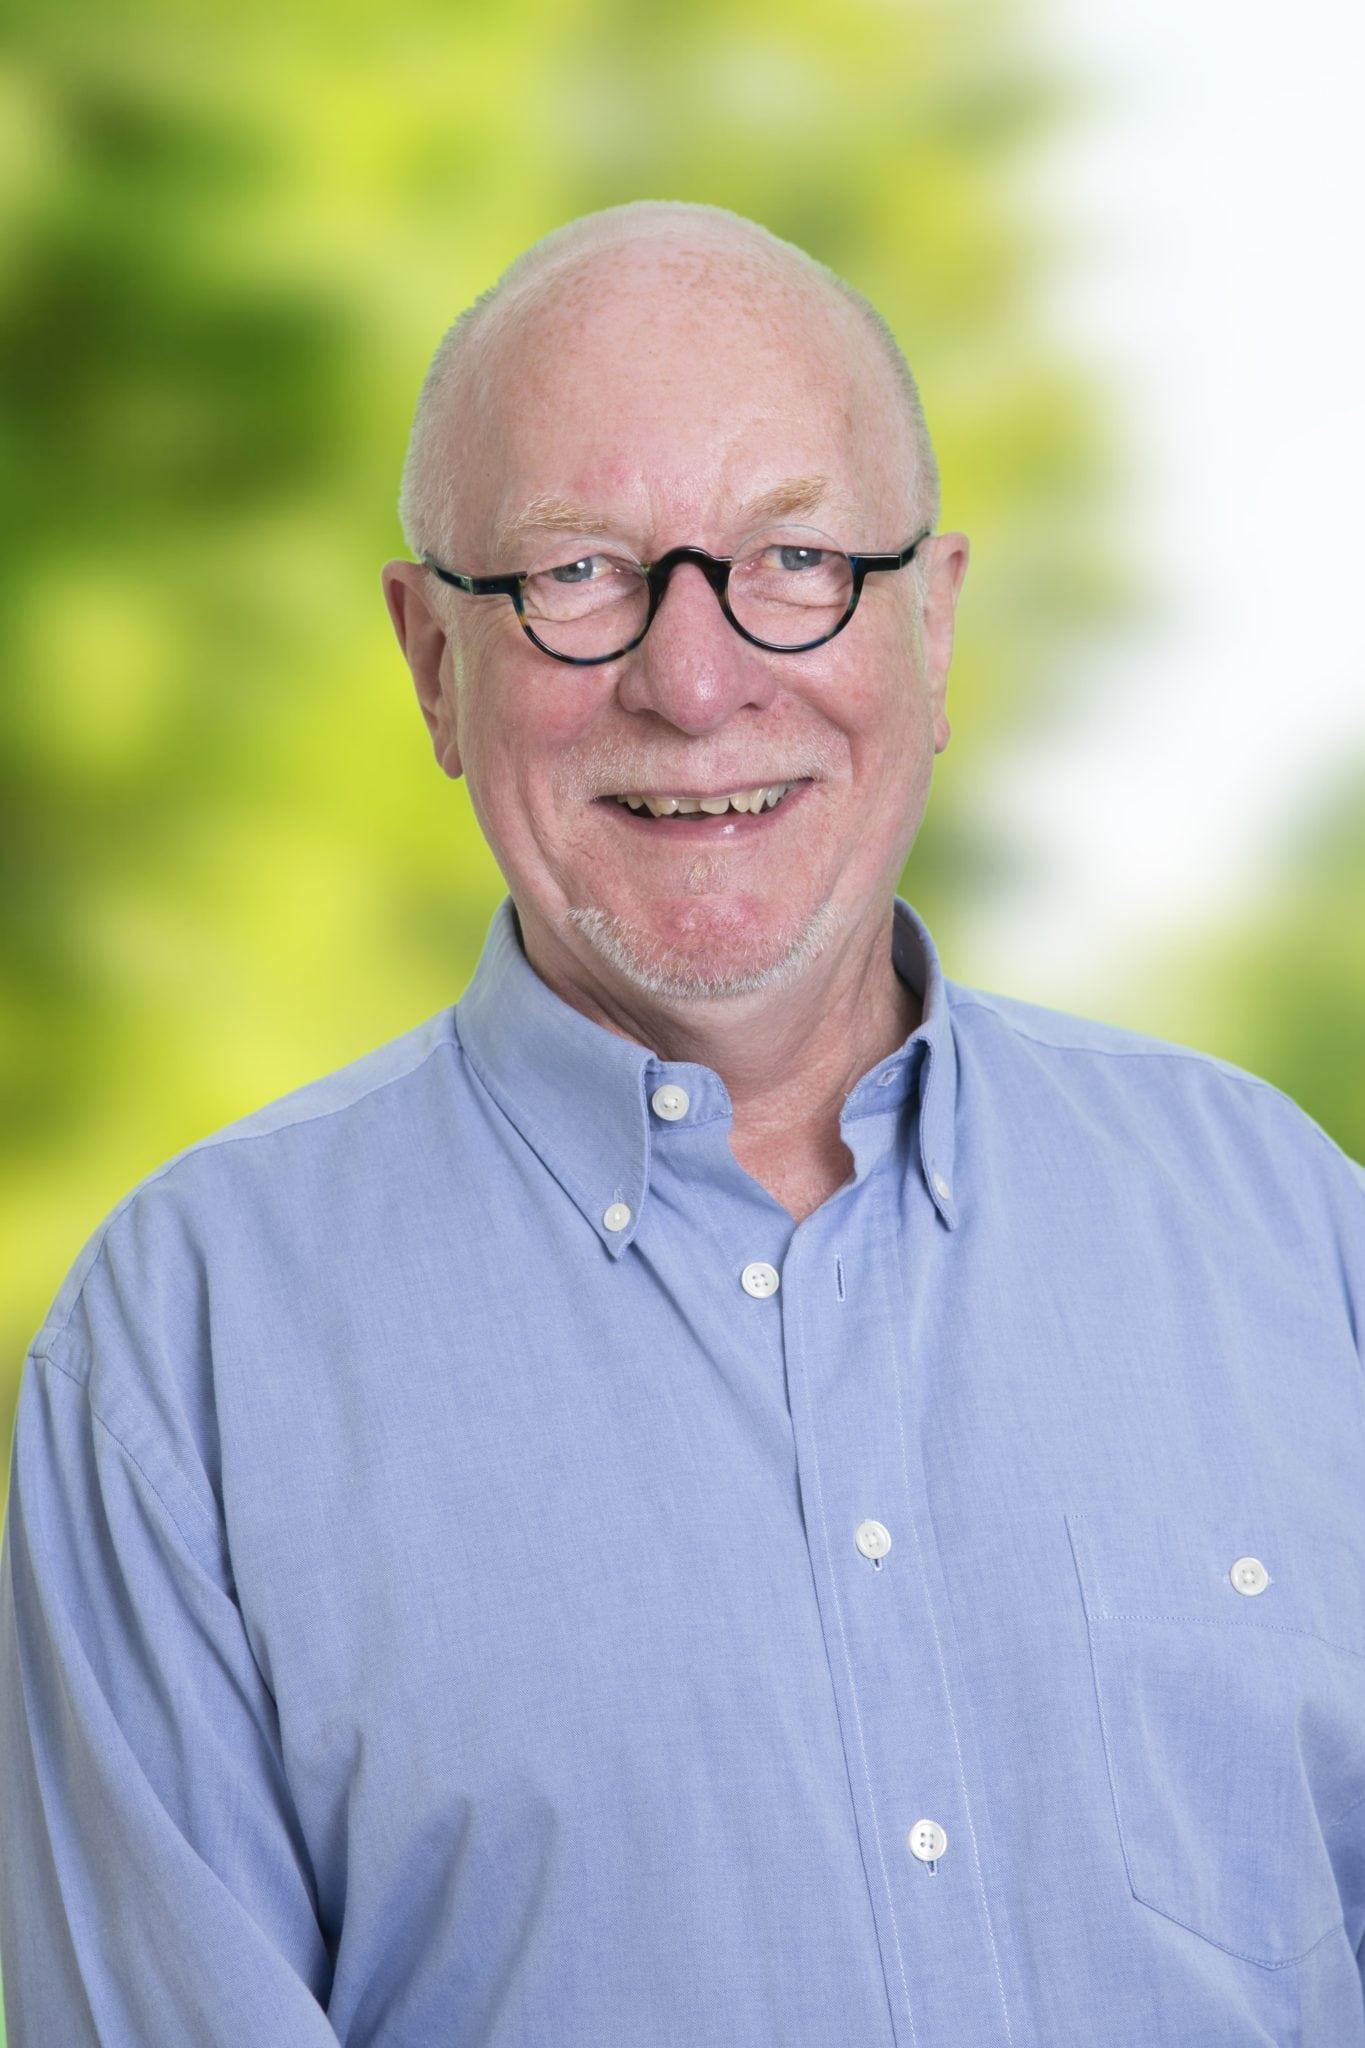 Pierre-Charles LIGOT